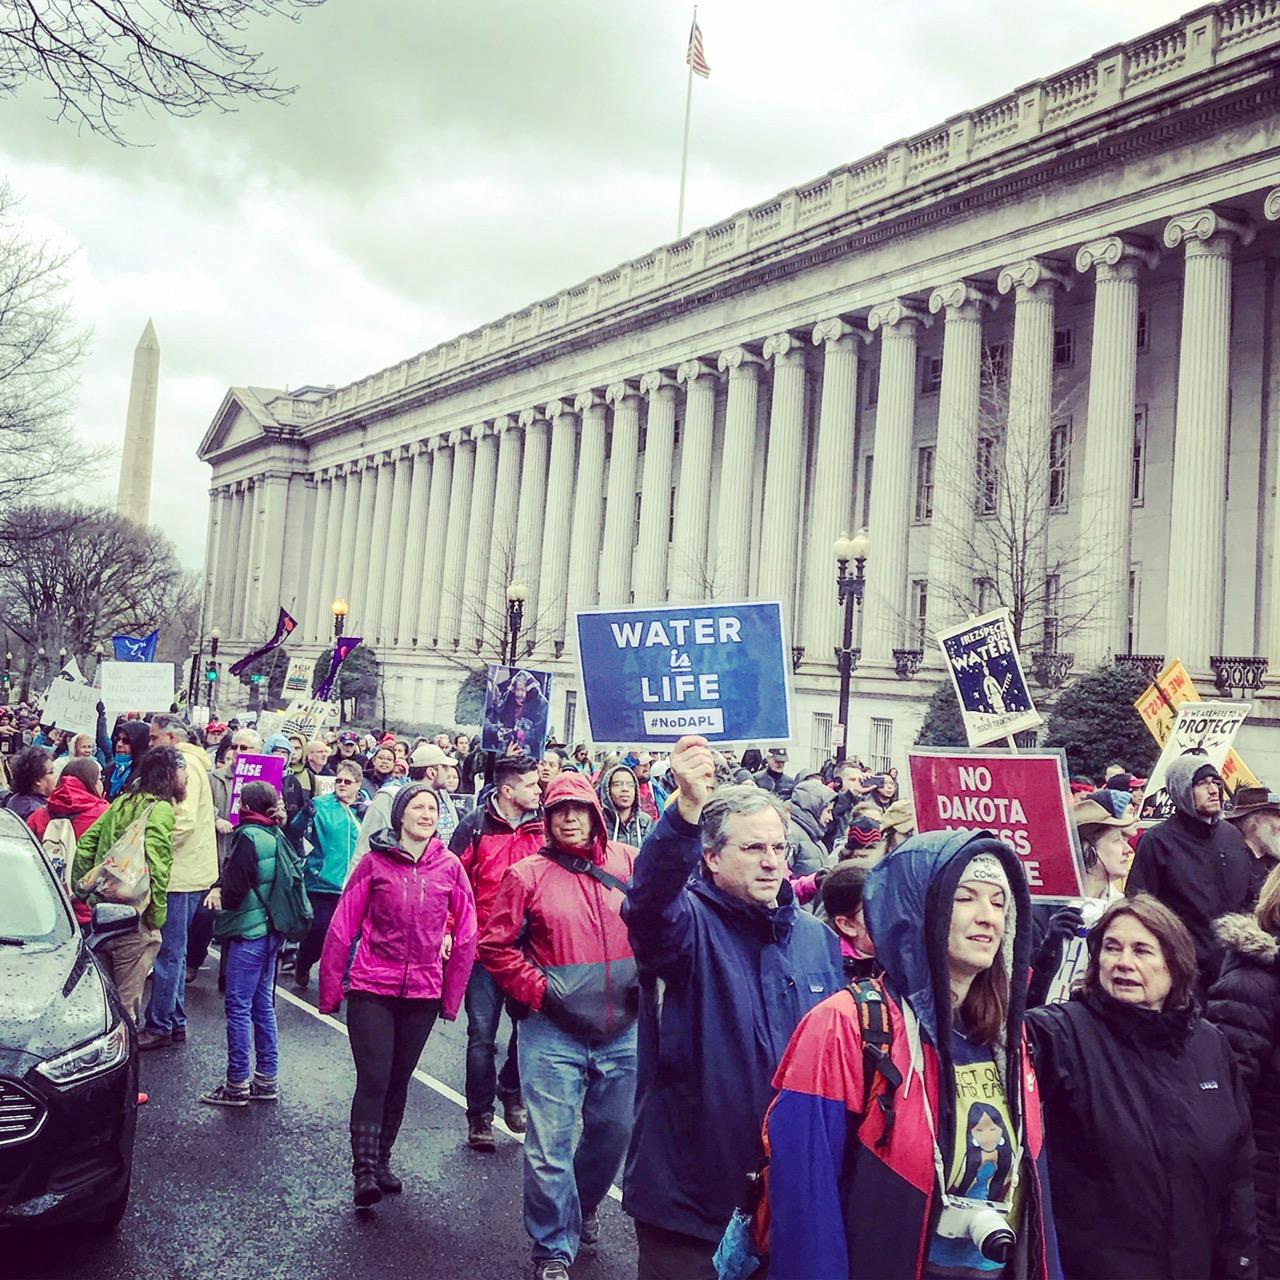 Washington DC, March 10, 2017